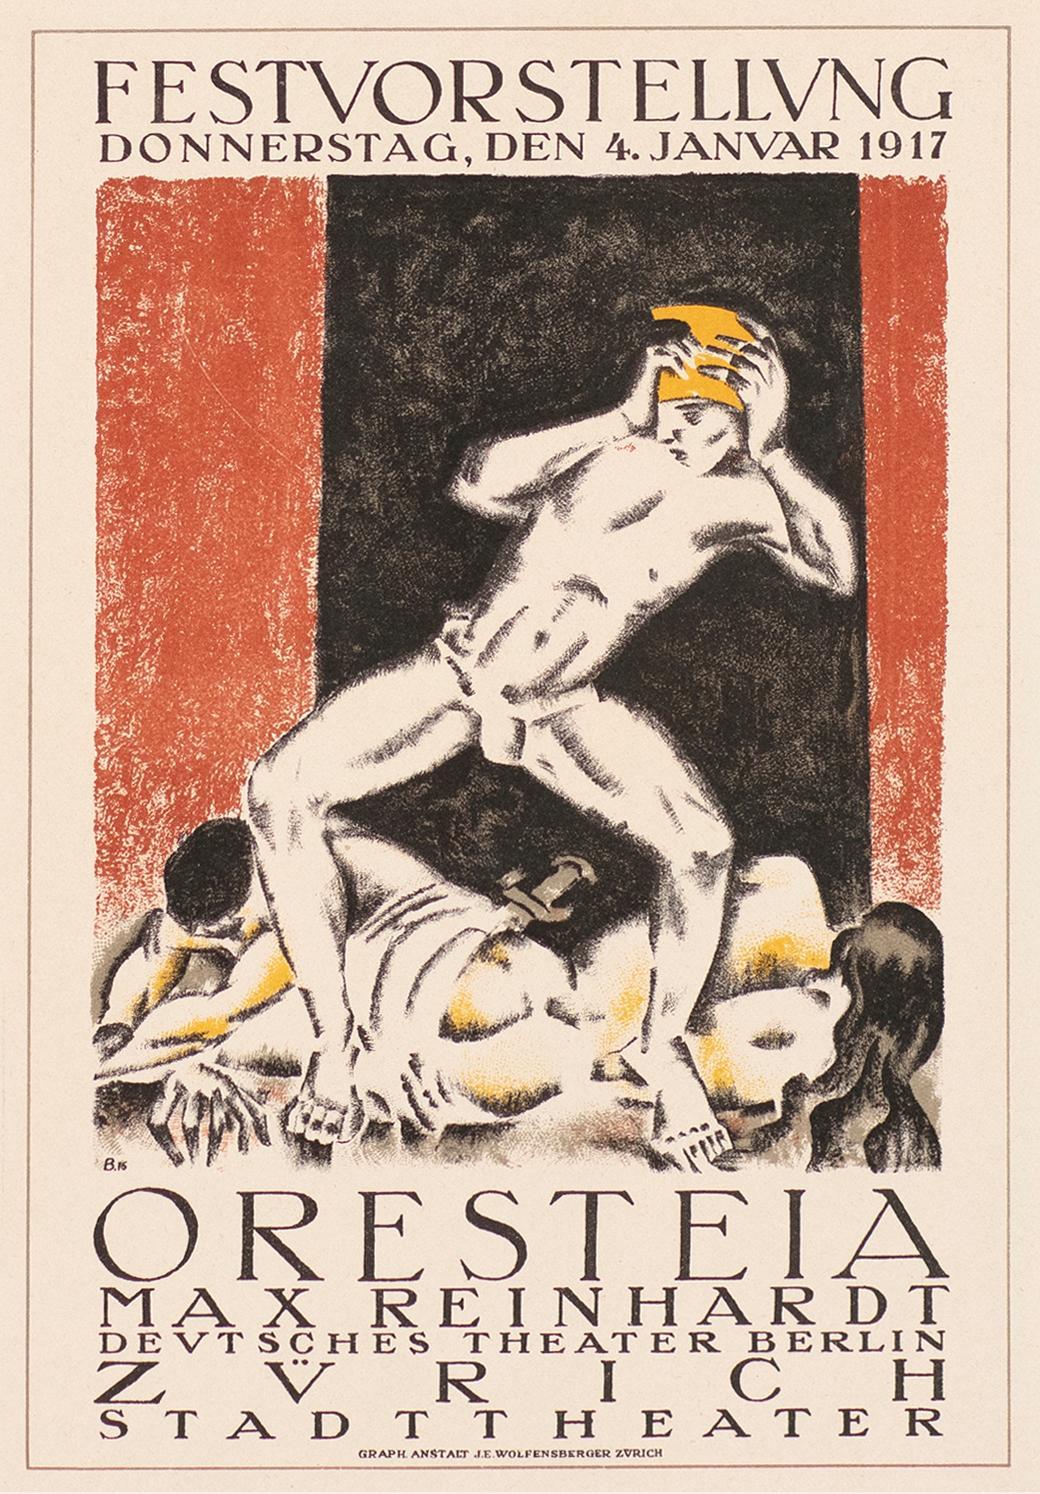 Max Reinhardt's Oresteia, Avant garde expressionist lithograph, 1917